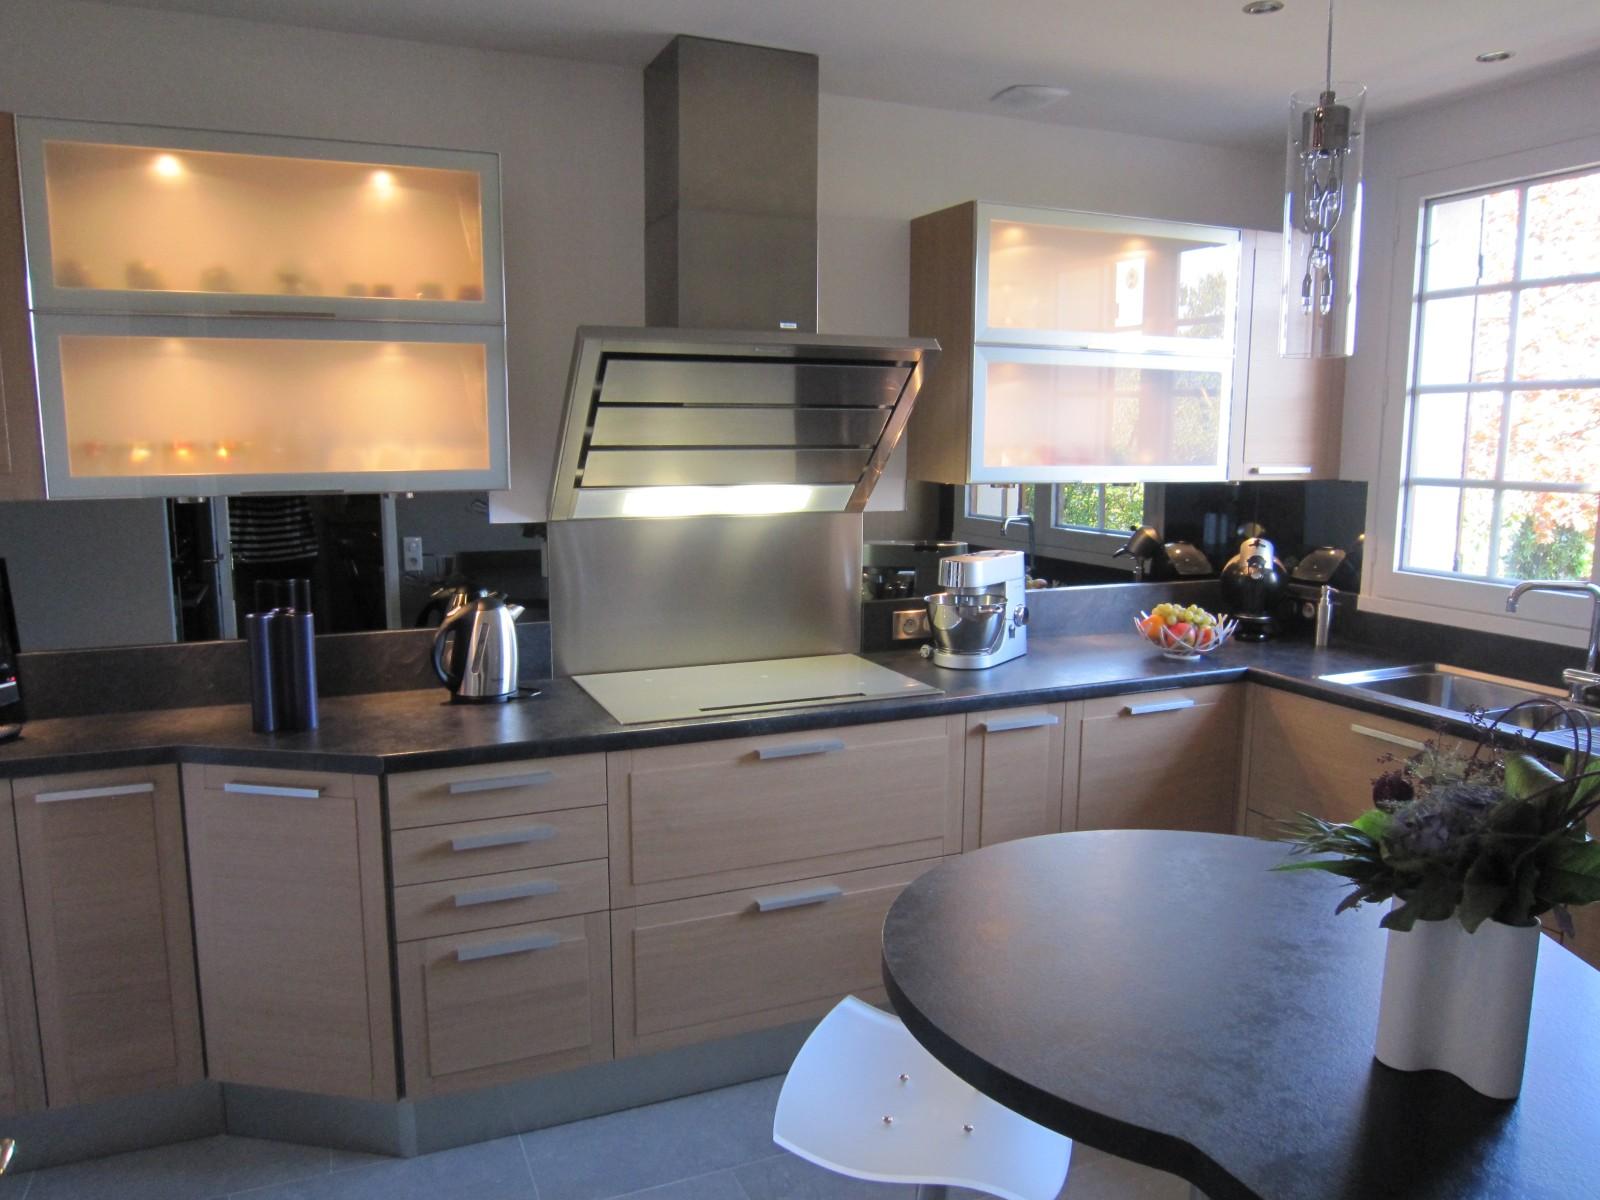 Modele k105 chene blanchi cuisines couloir for Asticots blancs cuisine